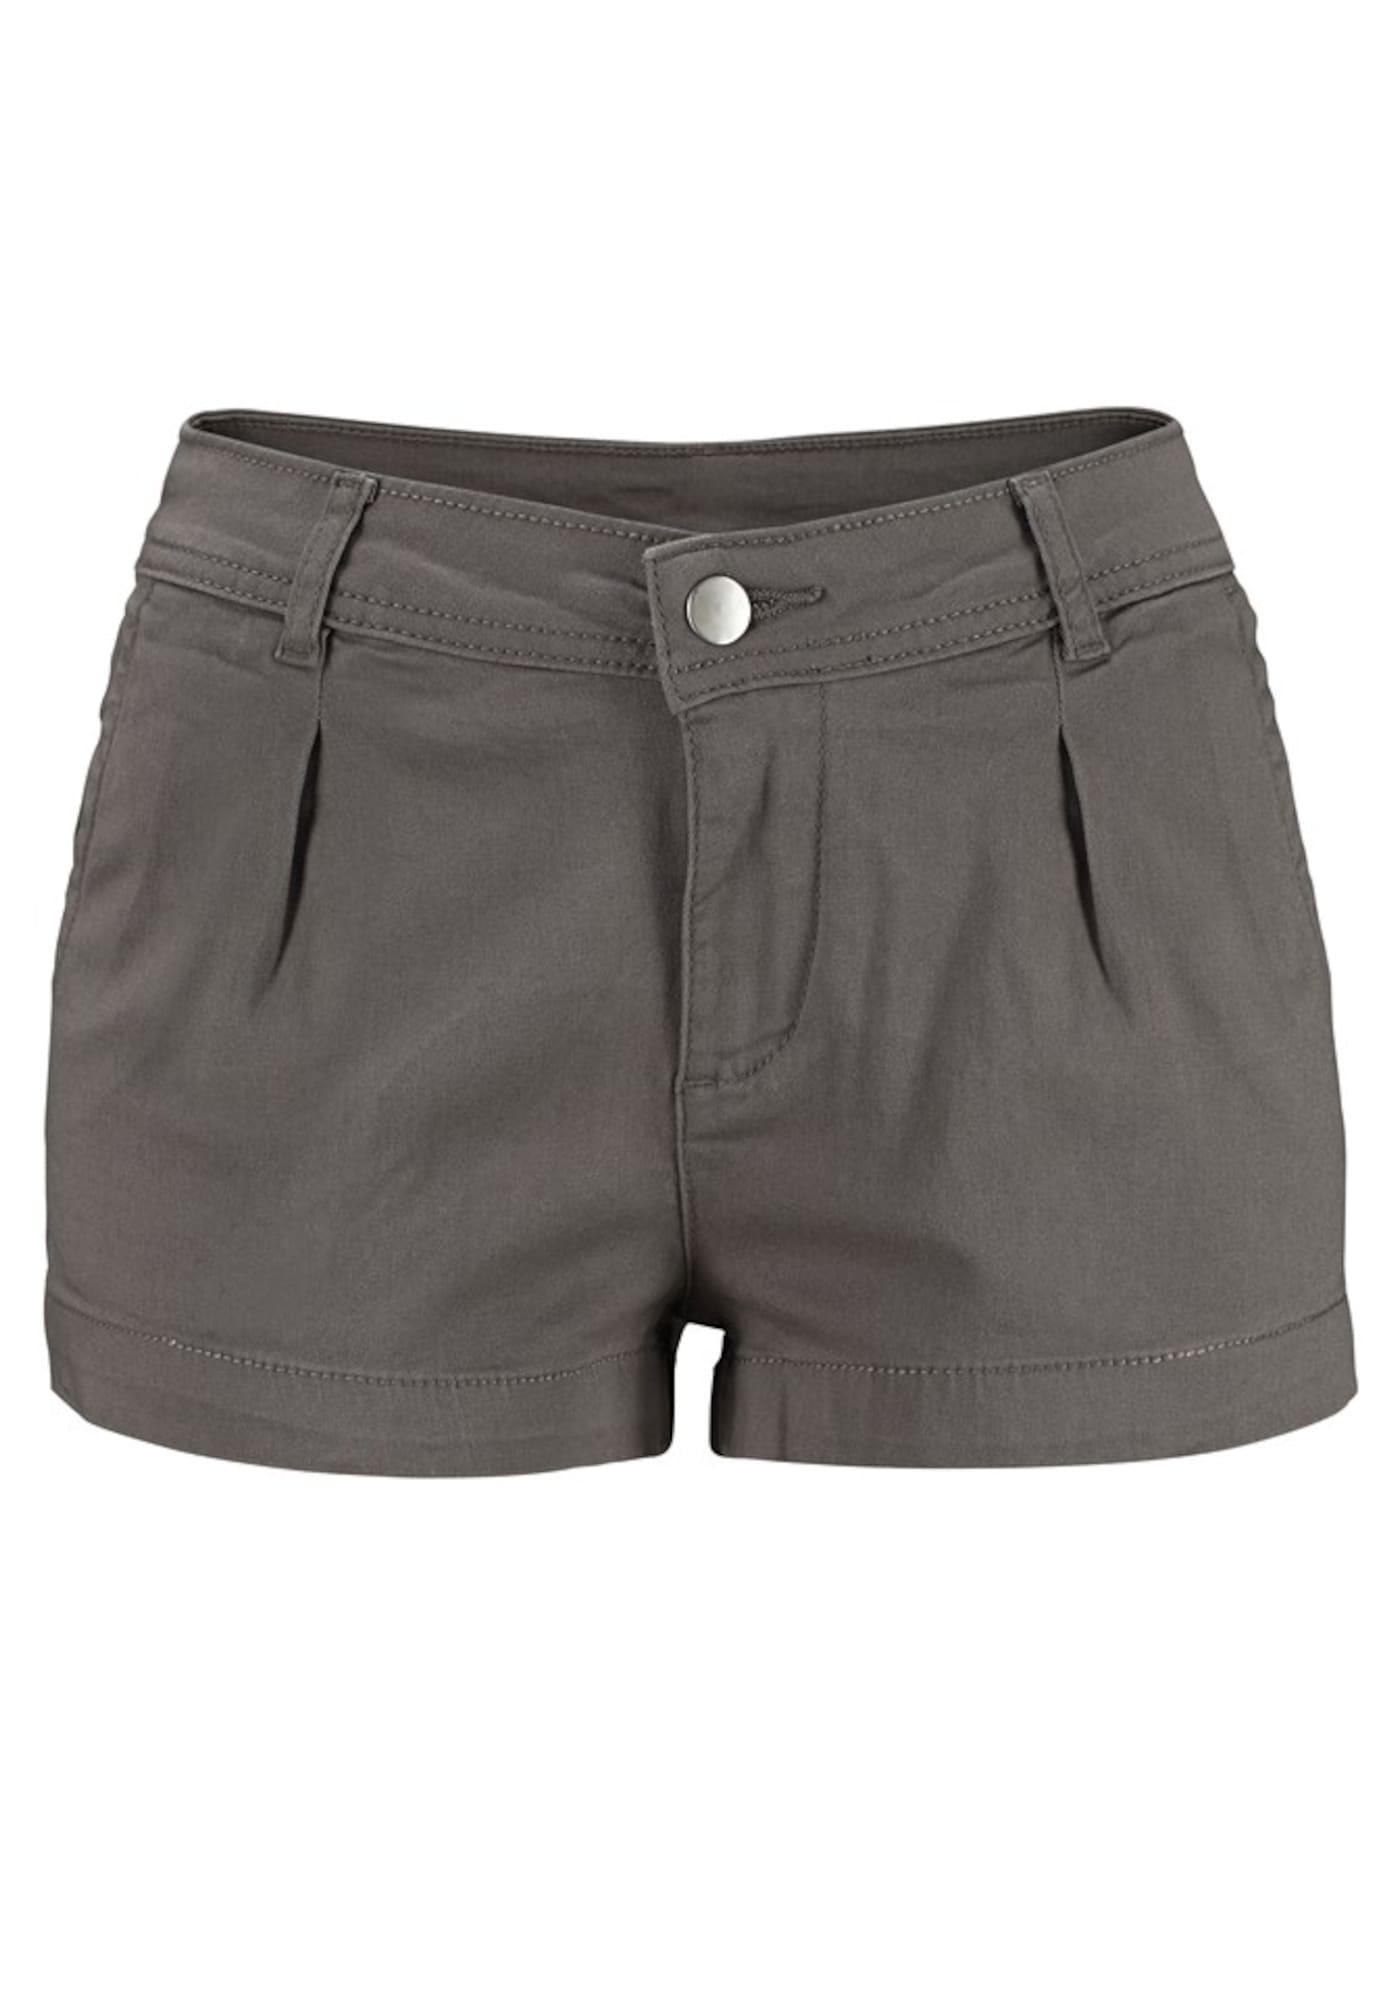 Hotpants | Bekleidung > Hosen > Hotpants | Grau - Khaki | Lascana